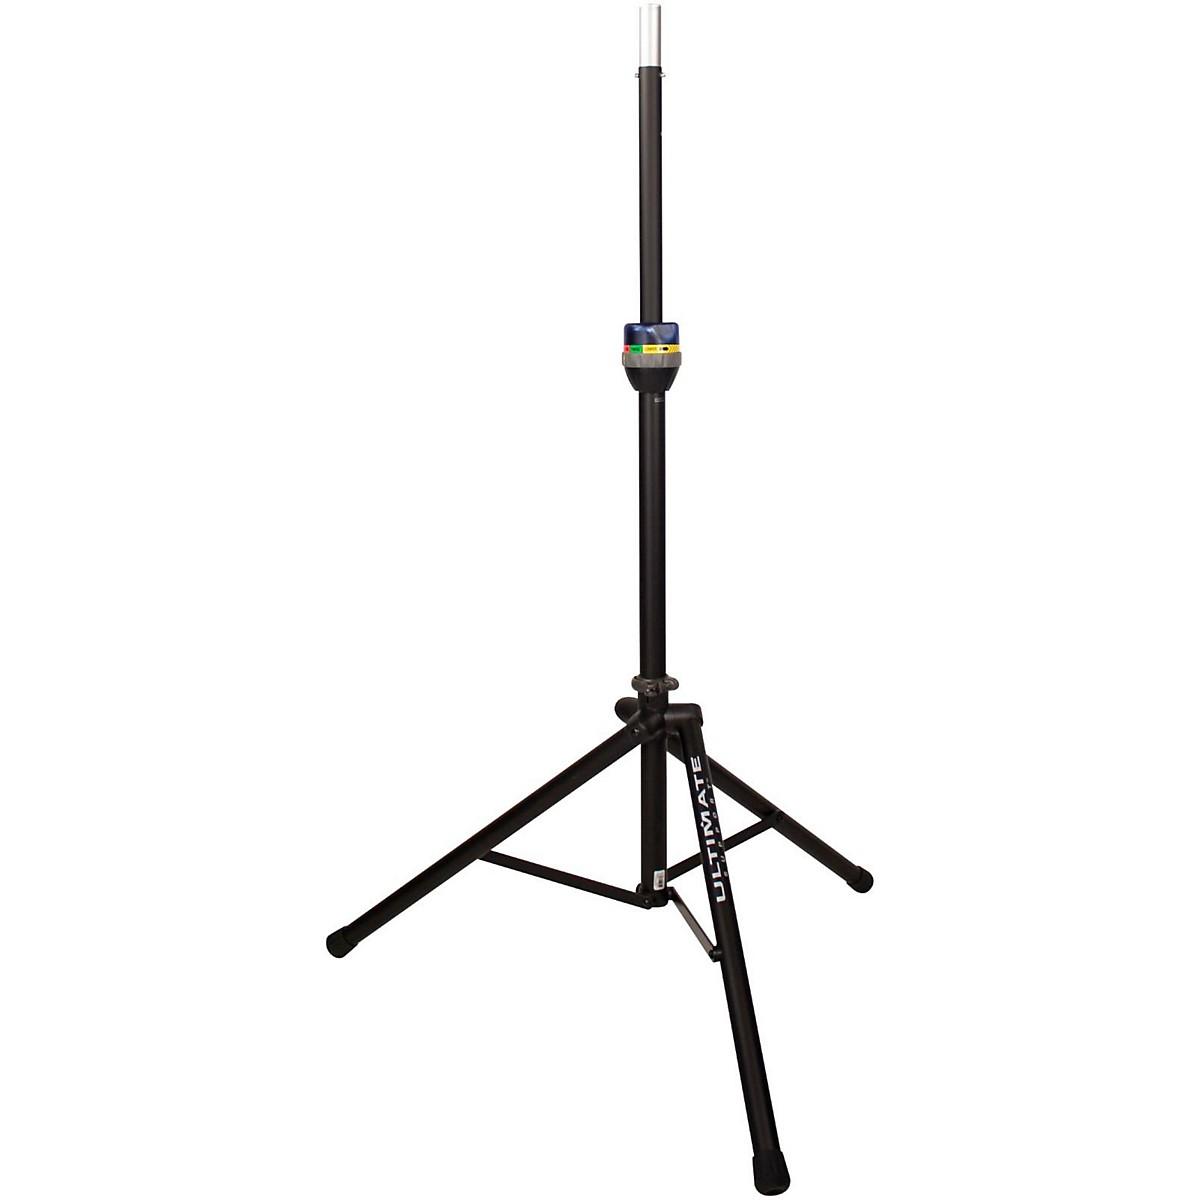 Ultimate Support TS-90B TeleLock Tripod Speaker Stand